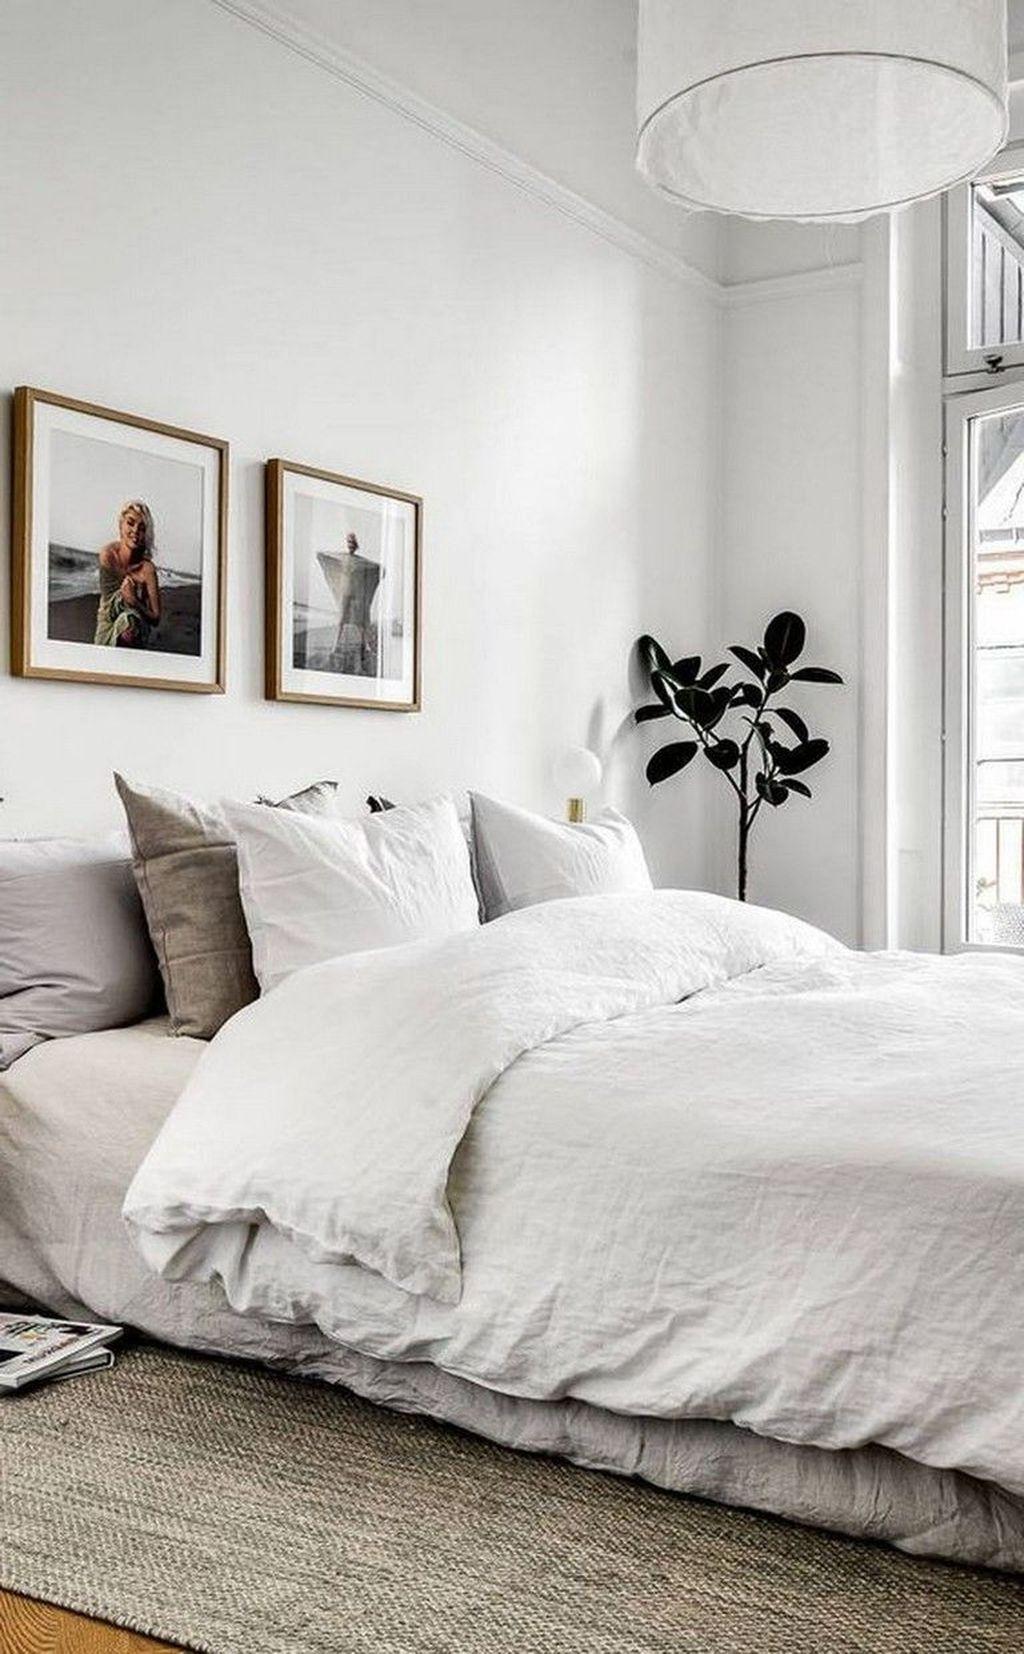 Best Minimalist Bedroom Design Ideas To Try Asap 32